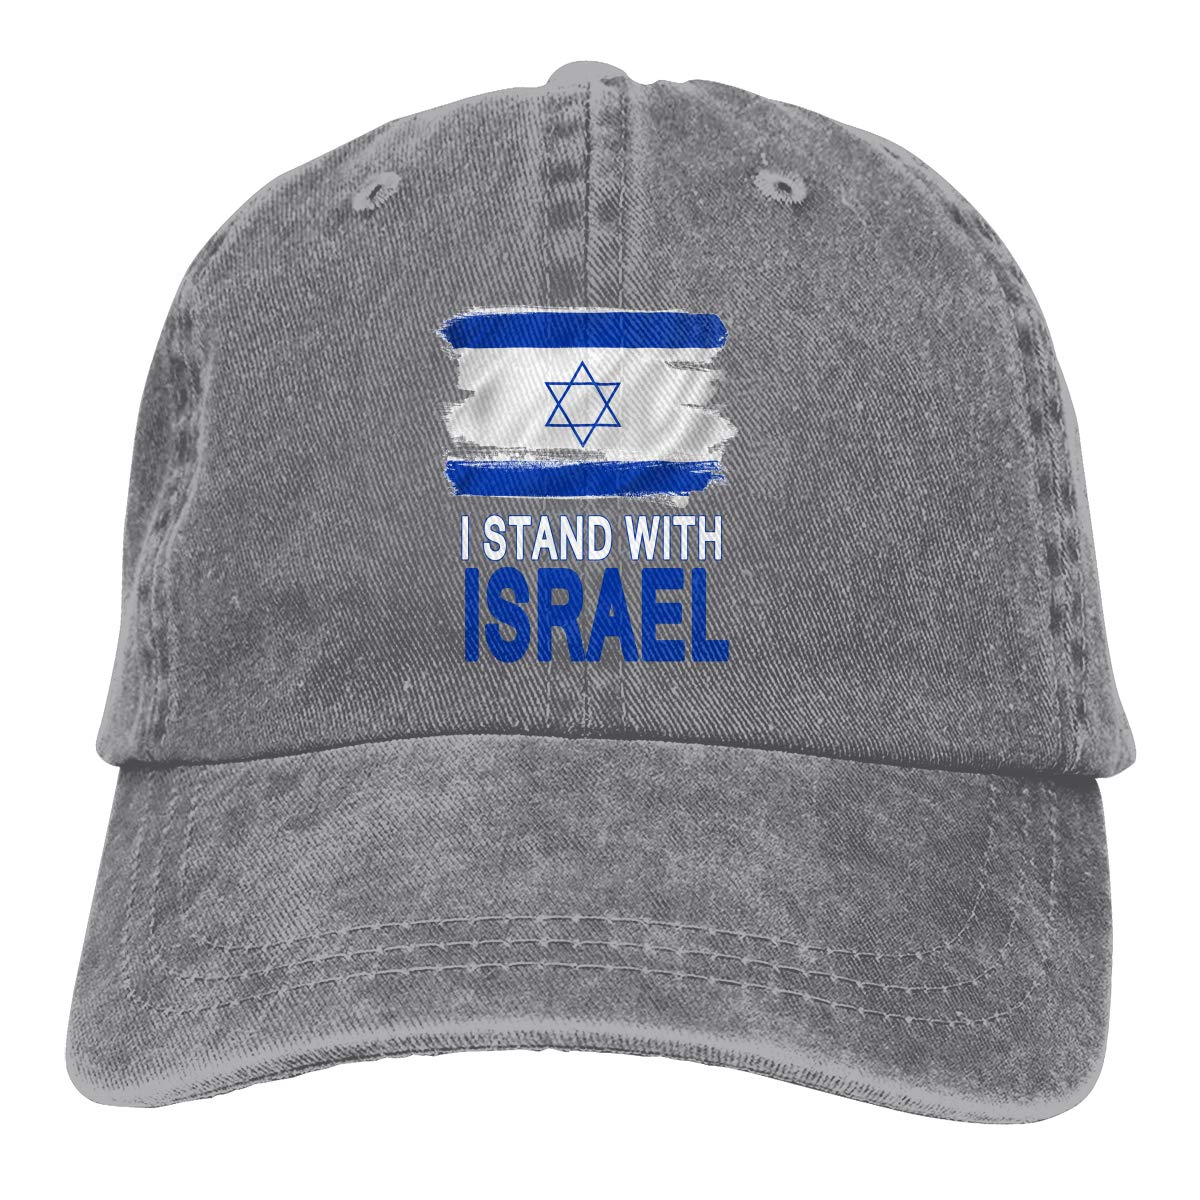 Israel Independence Day 70th Unisex Custom Jeans Hip Hop Cap Adjustable Baseball Cap